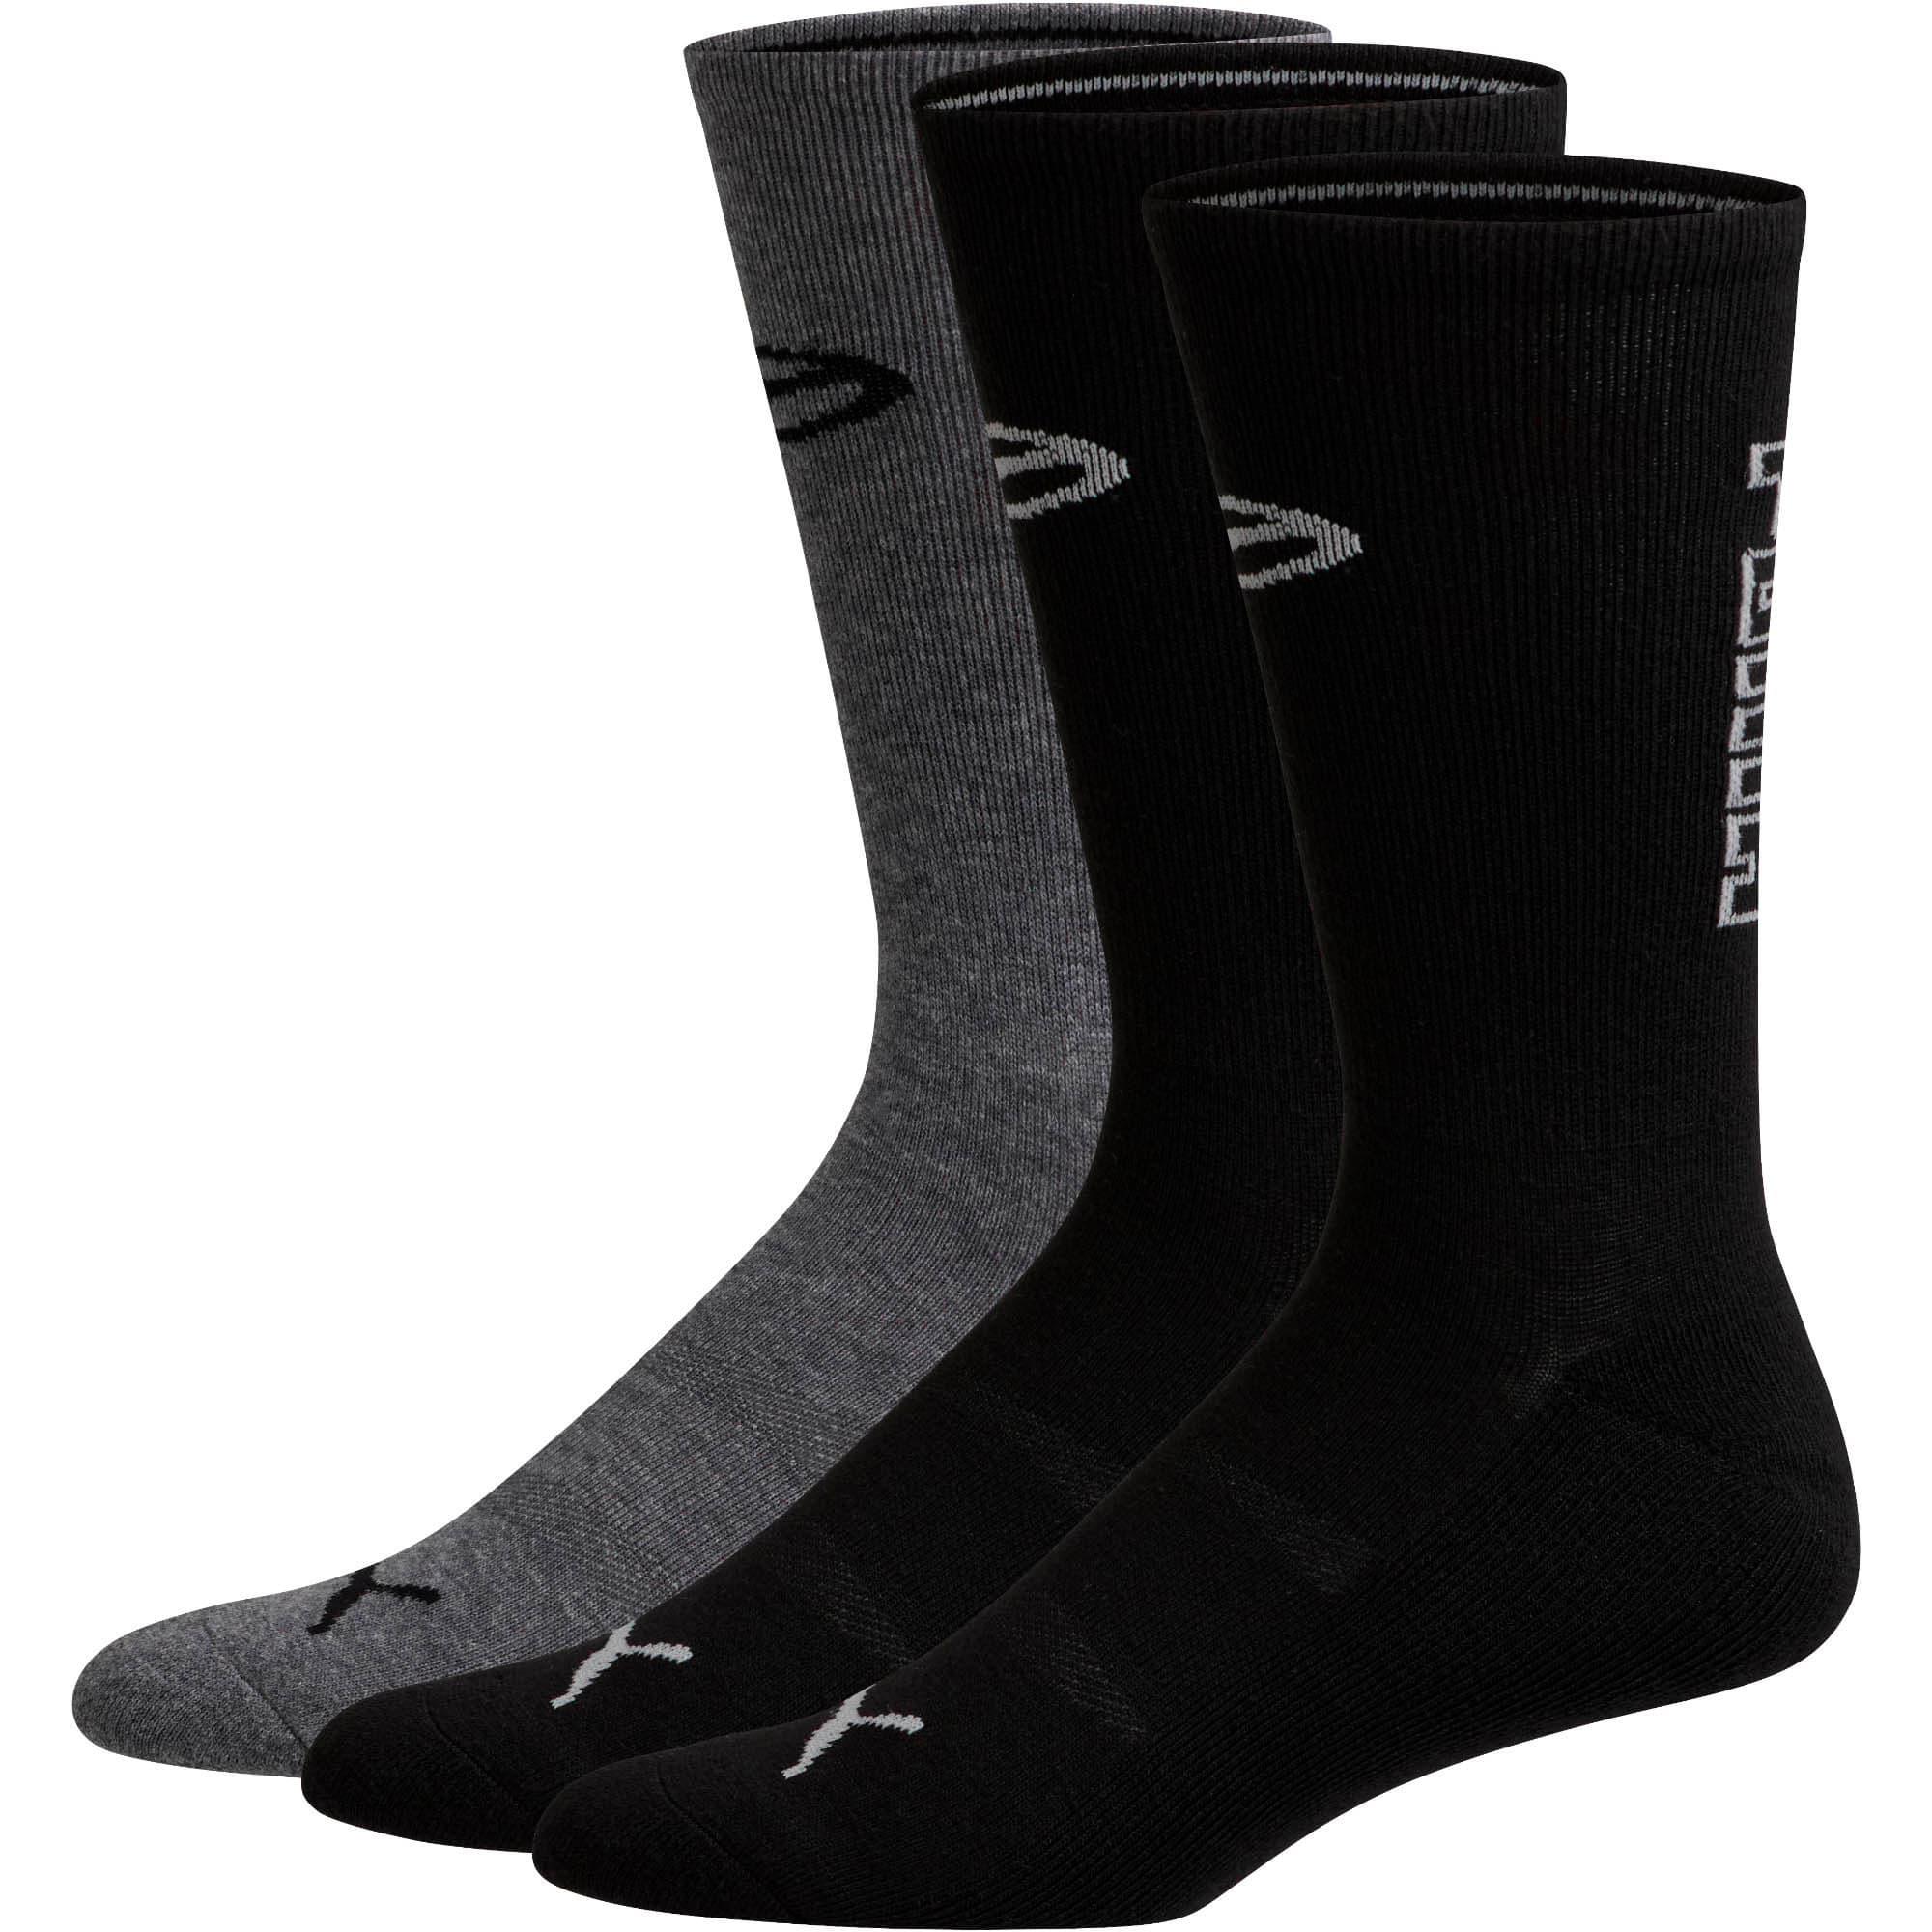 Thumbnail 1 of Men's Fashion Crew Socks [3 Pack], BLACK / GREY, medium